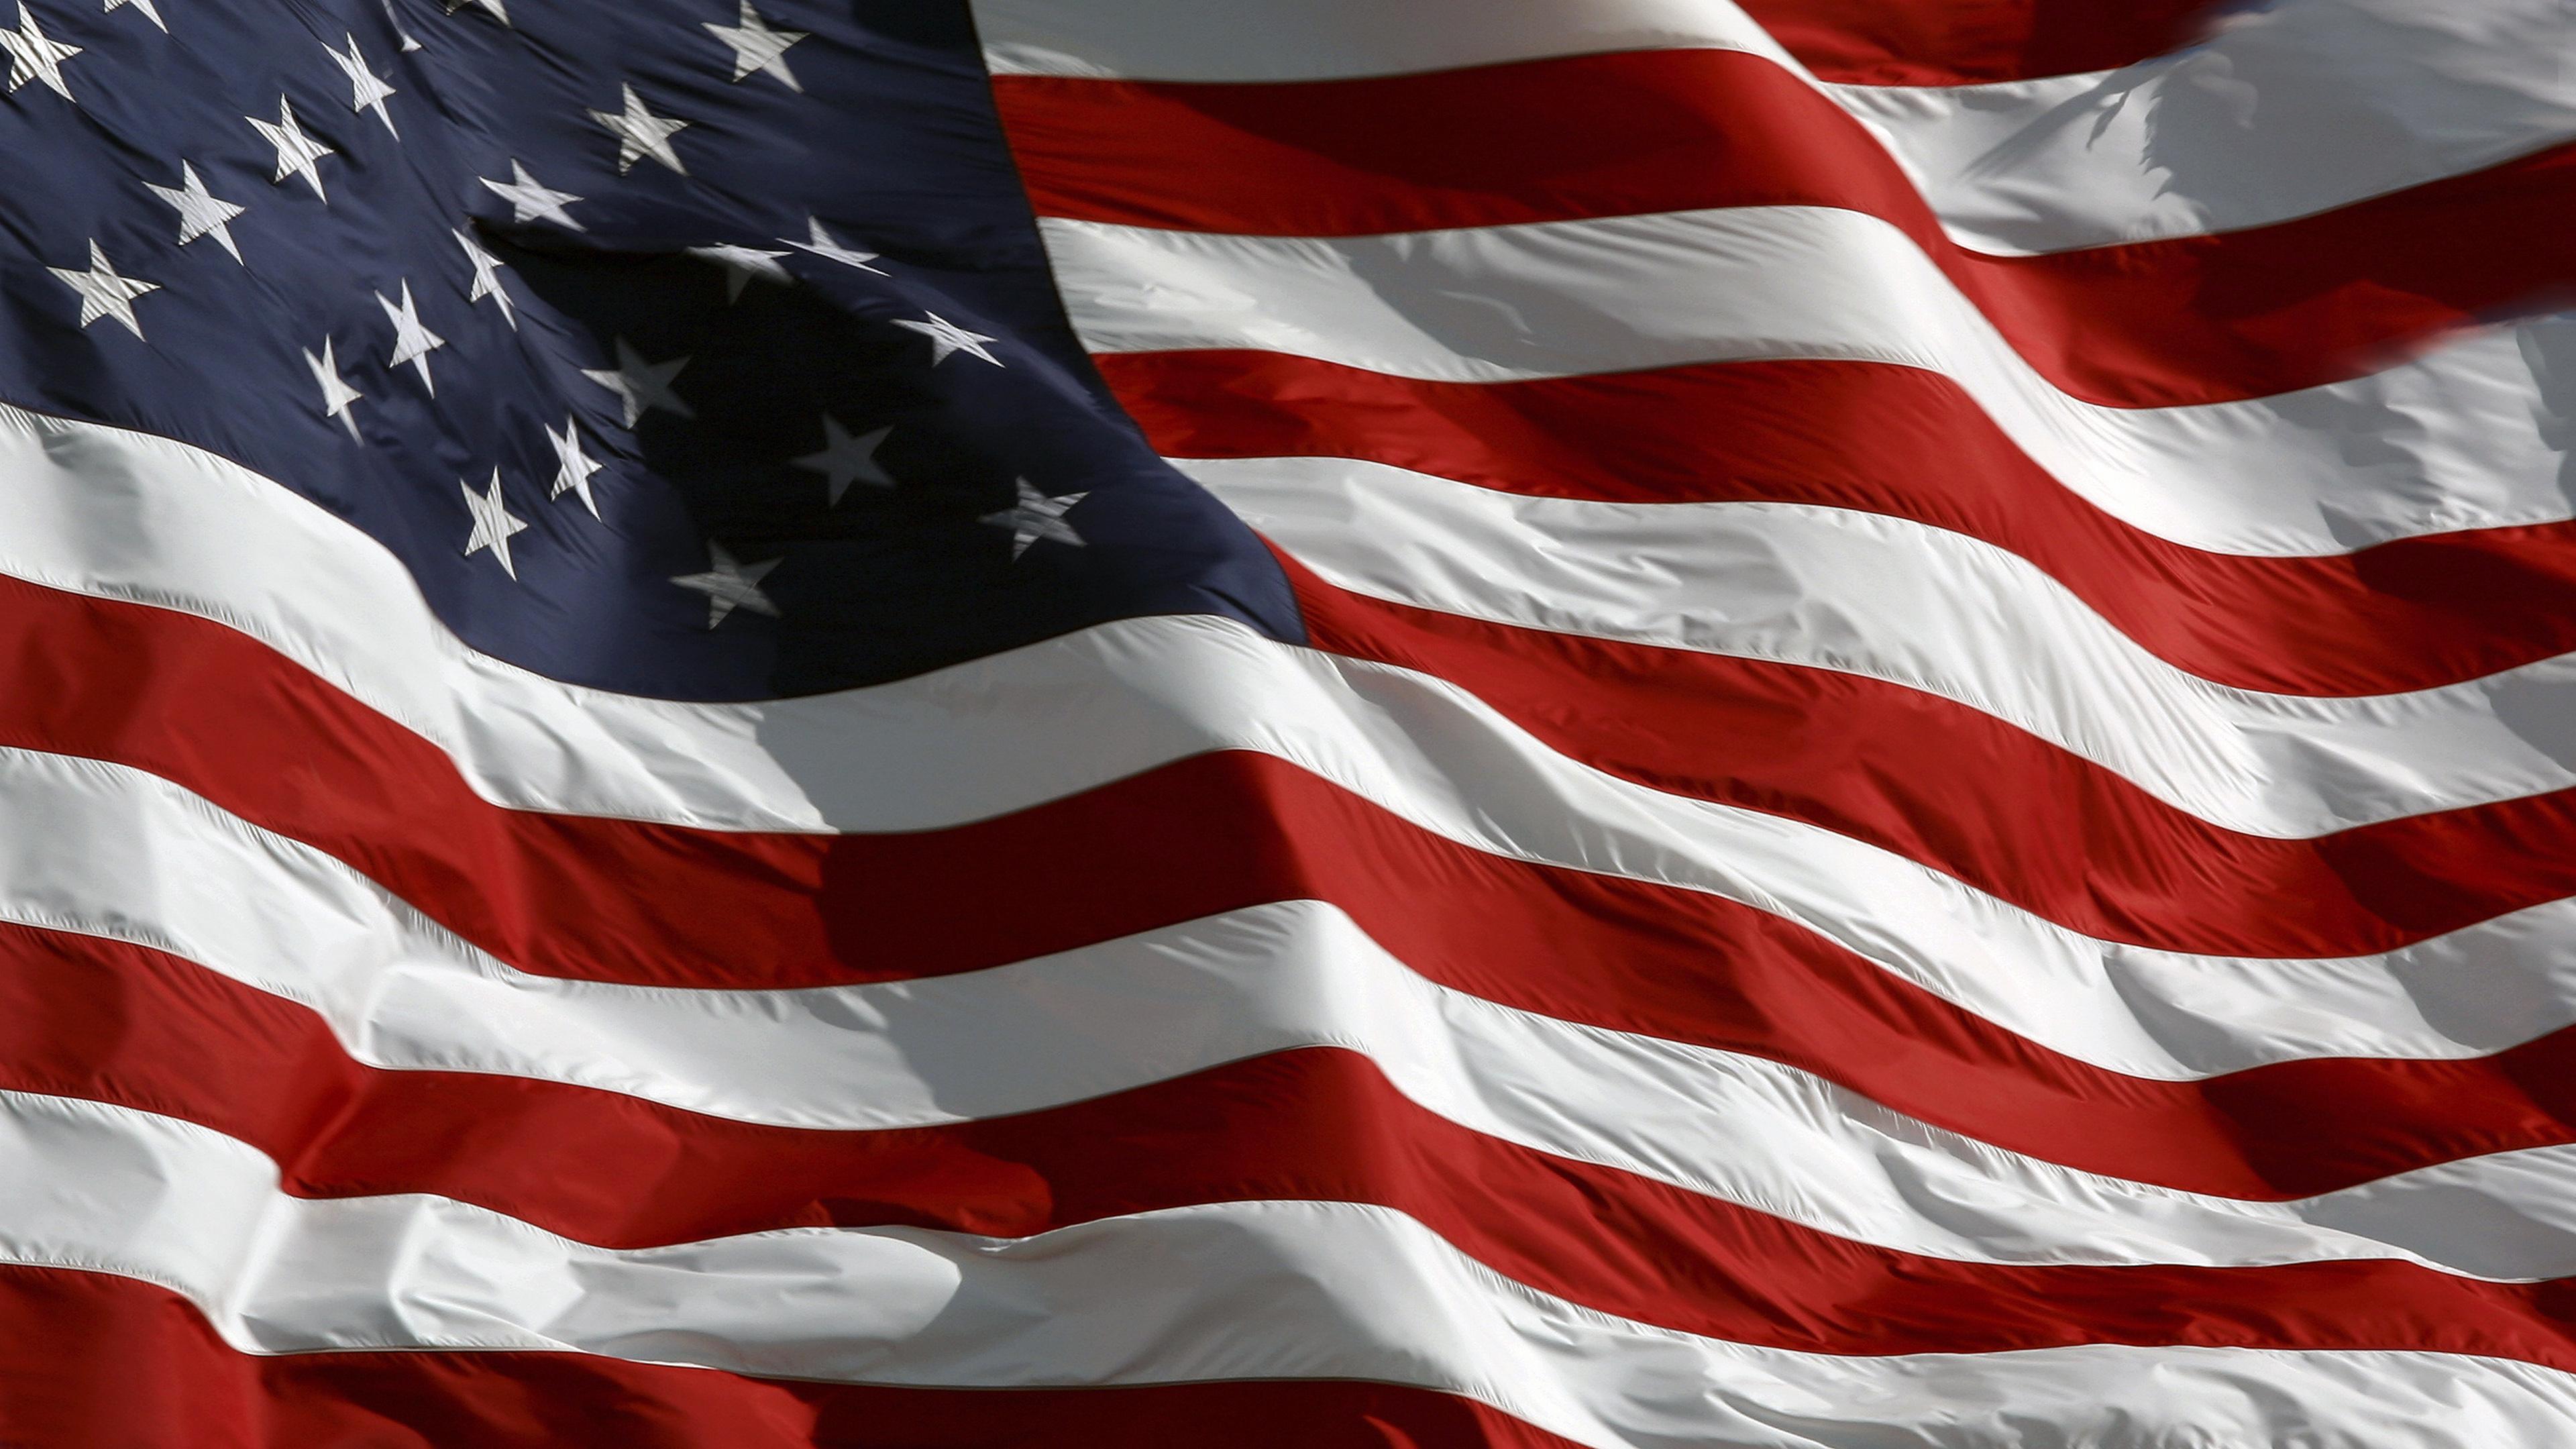 Dota 1 Heroes Wallpaper Hd American Flag For Desktop Wallpapers Hd Wallpapers13 Com